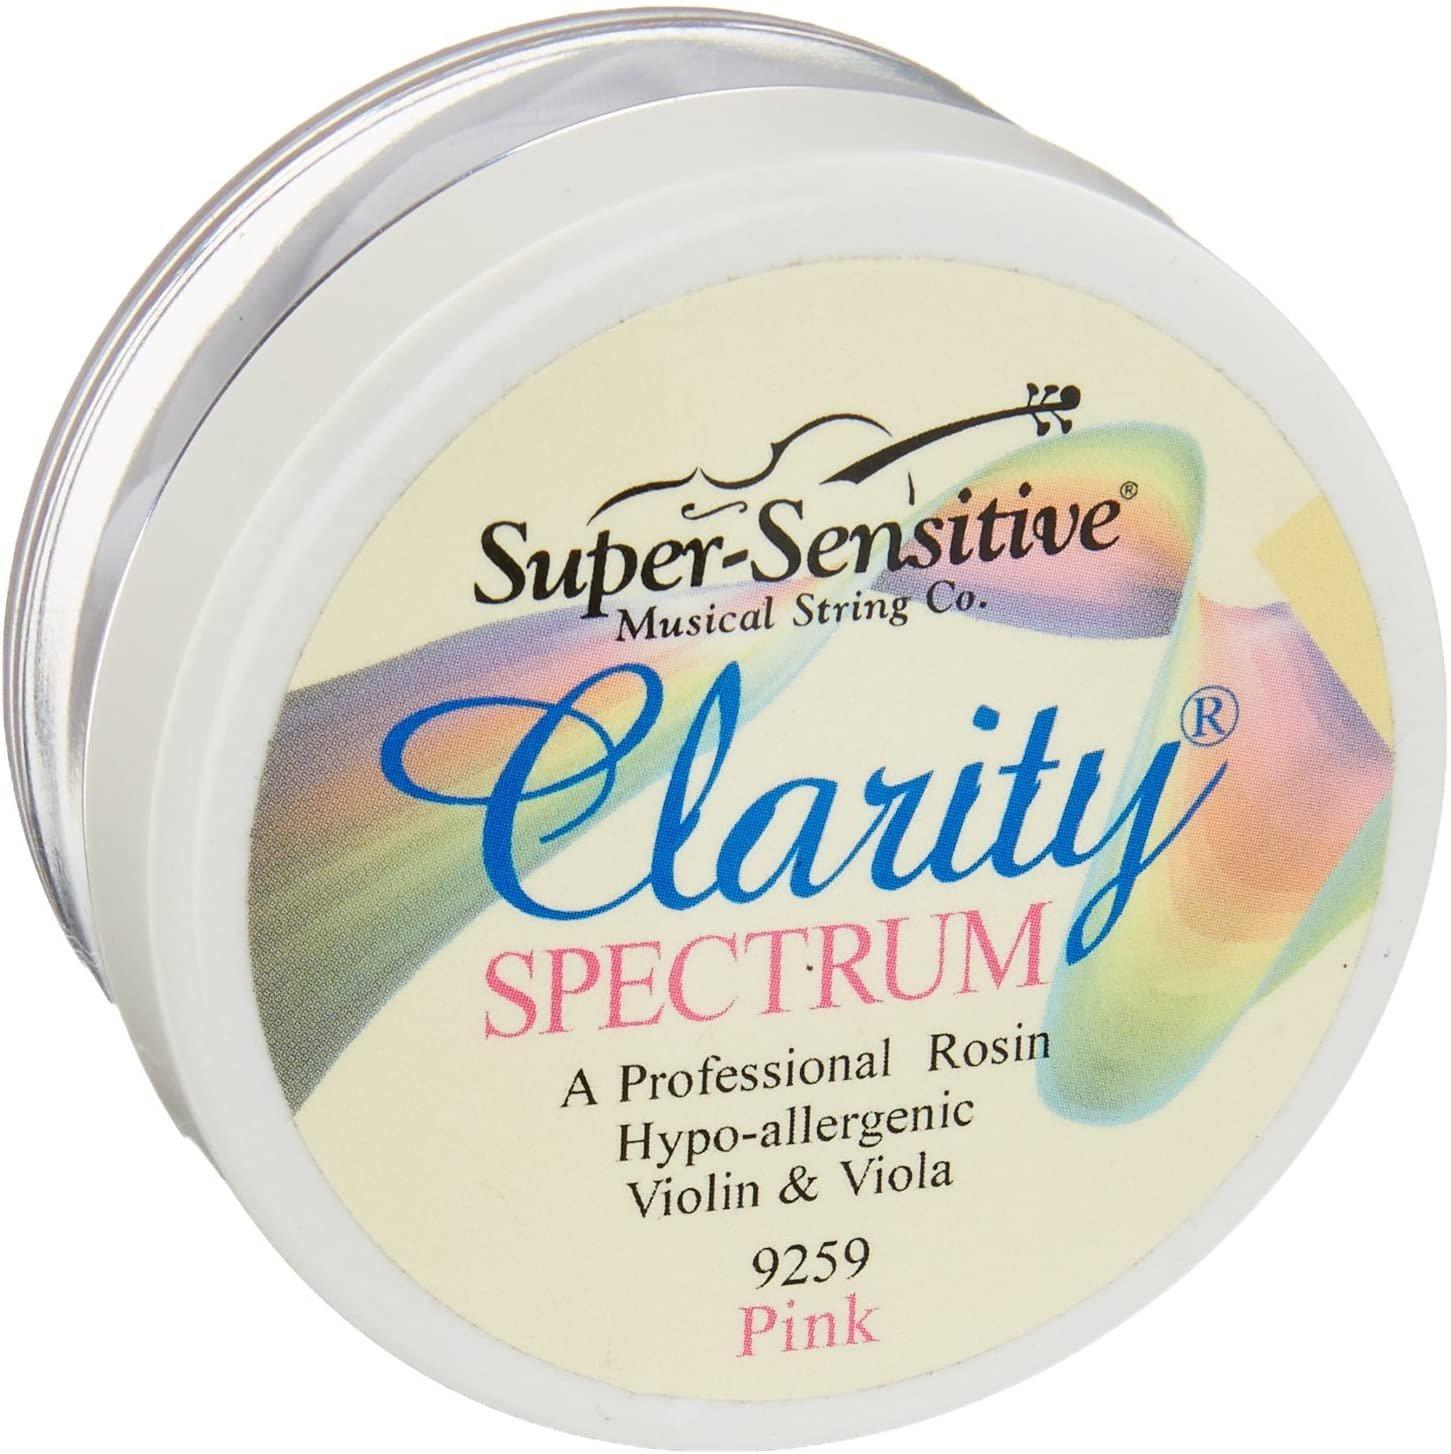 Super Sensitive Clarity Spectrum Violin/Viola Rosin Pink